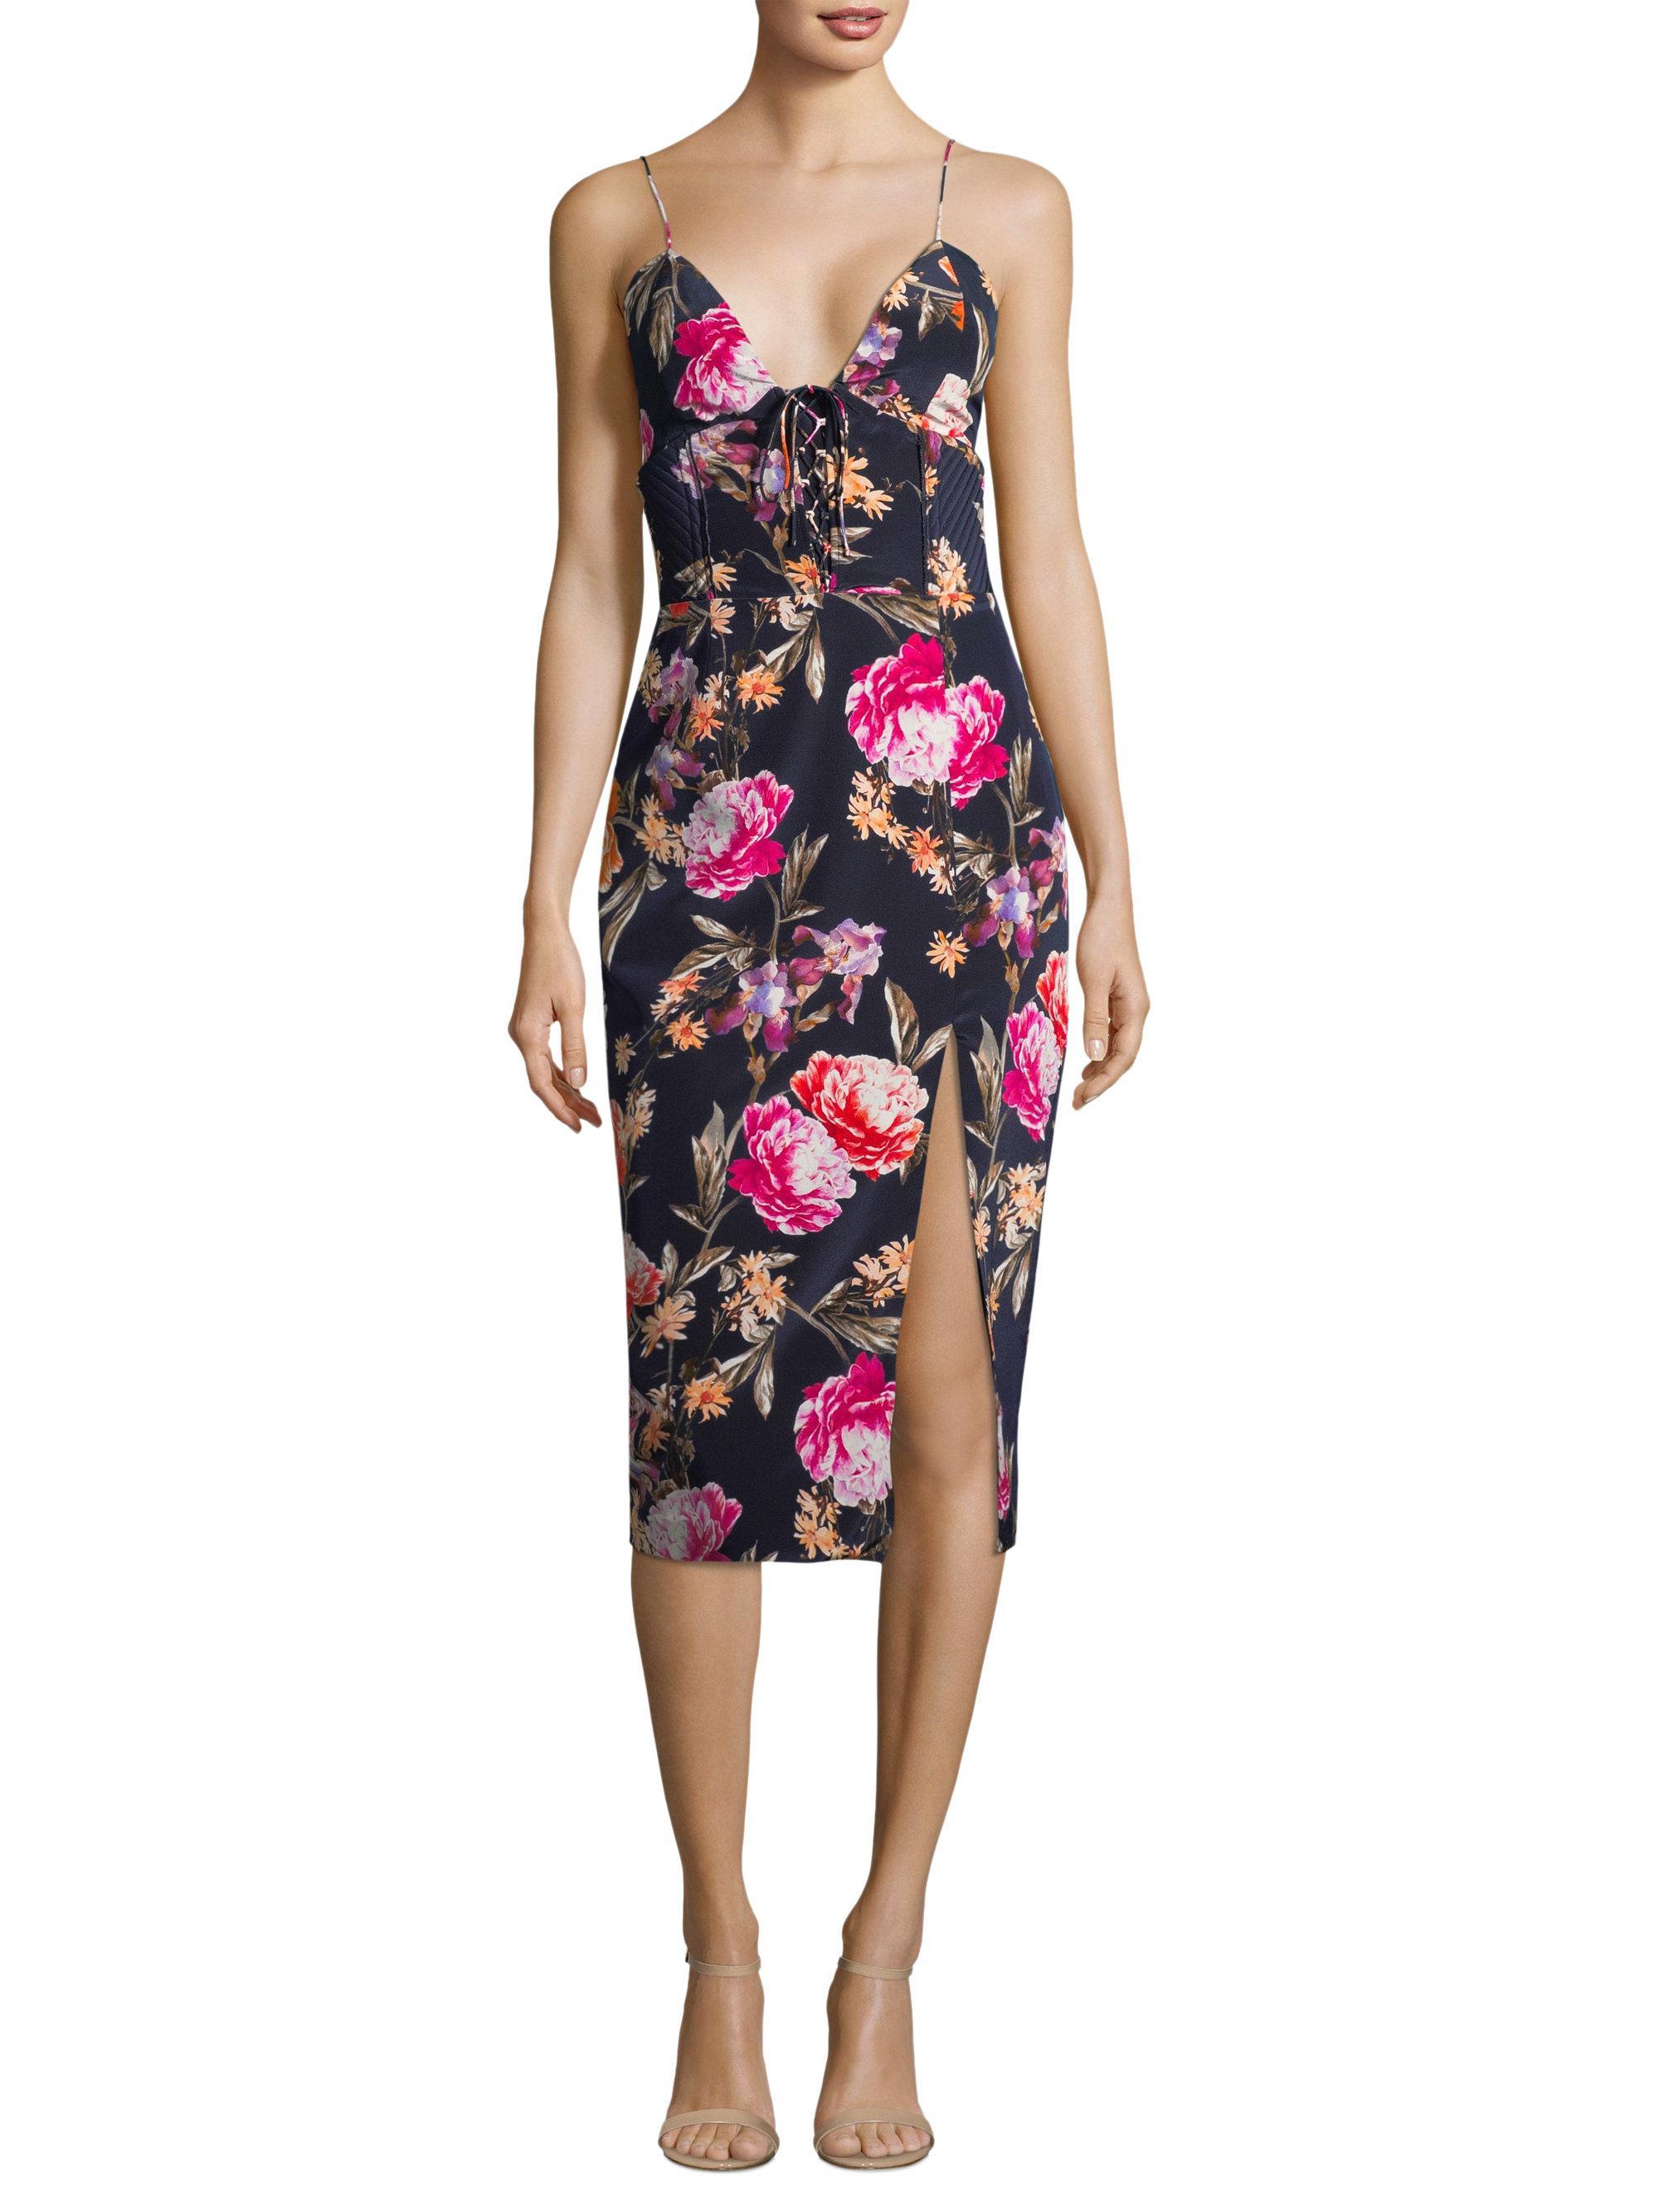 c4df9f47a6 Nicholas Lucile Silk Floral Dress in Blue - Lyst